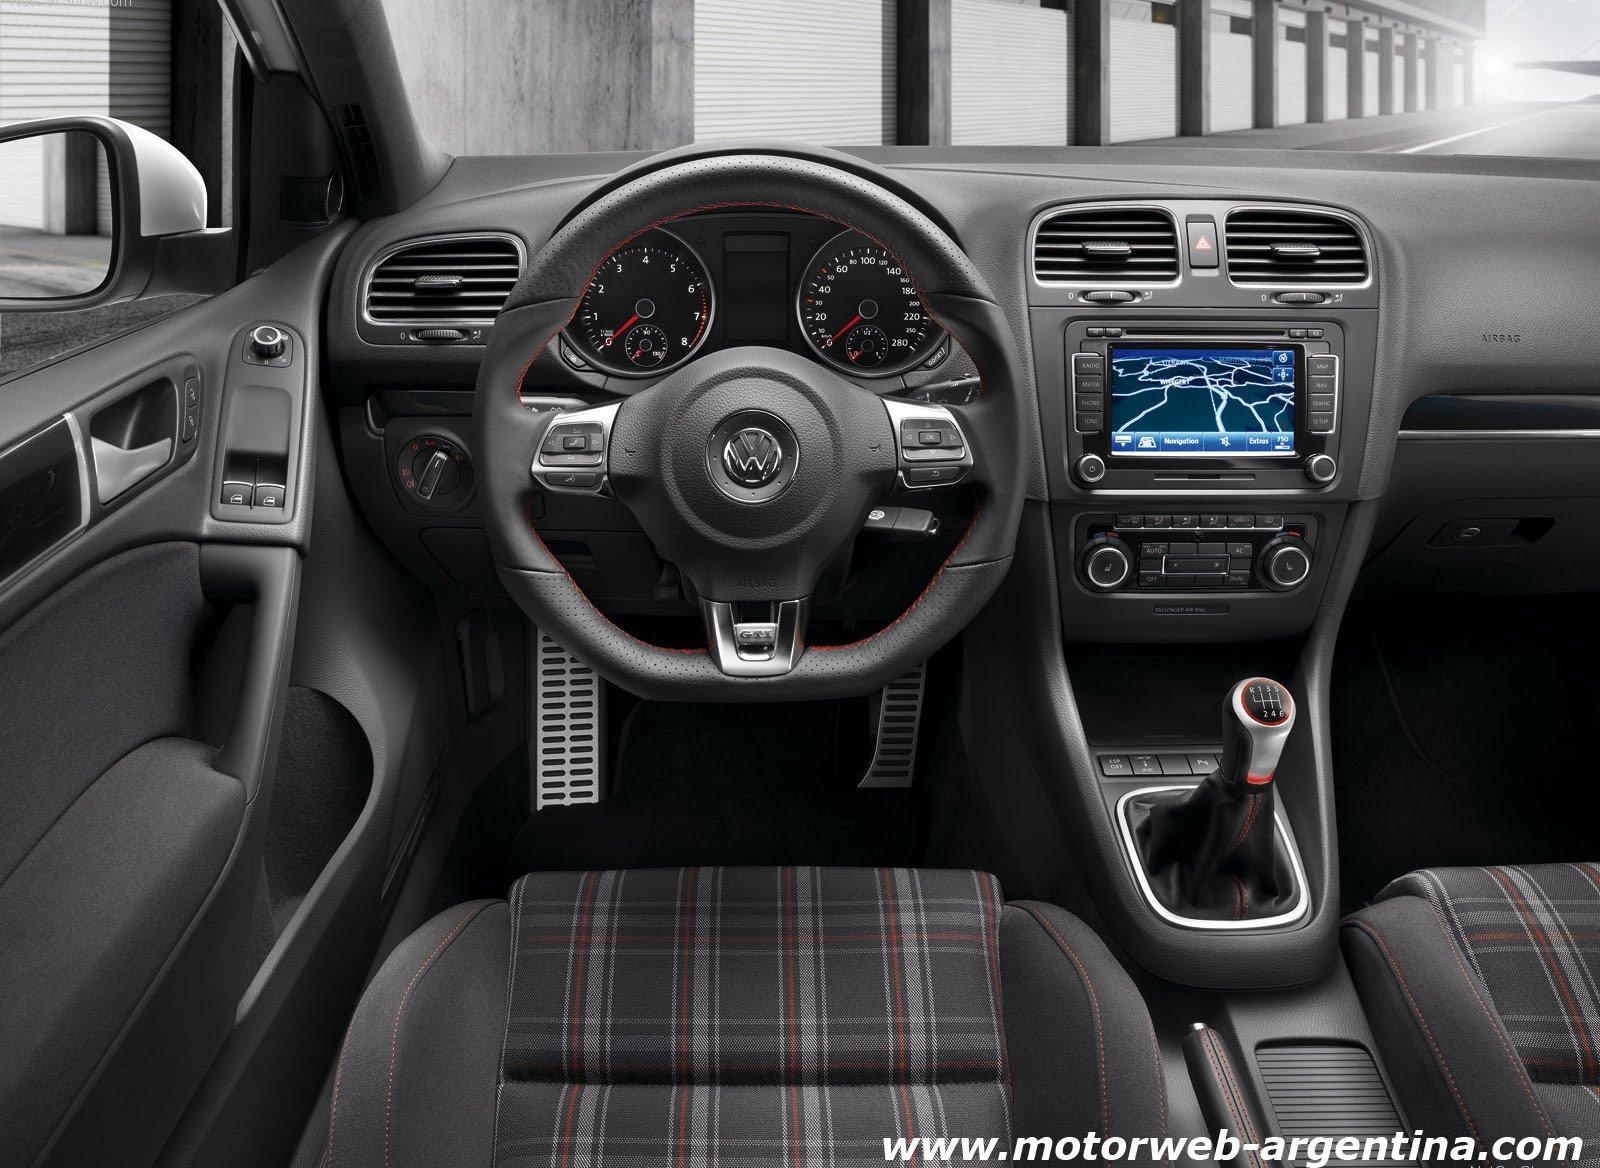 http://1.bp.blogspot.com/_aYHy9i_CR0Y/TFqoyBJkhtI/AAAAAAAAEdQ/DXaf3NNi510/s1600/Volkswagen-Golf_GTI_Concept_2008_1600x1200_wallpaper_0a.jpg